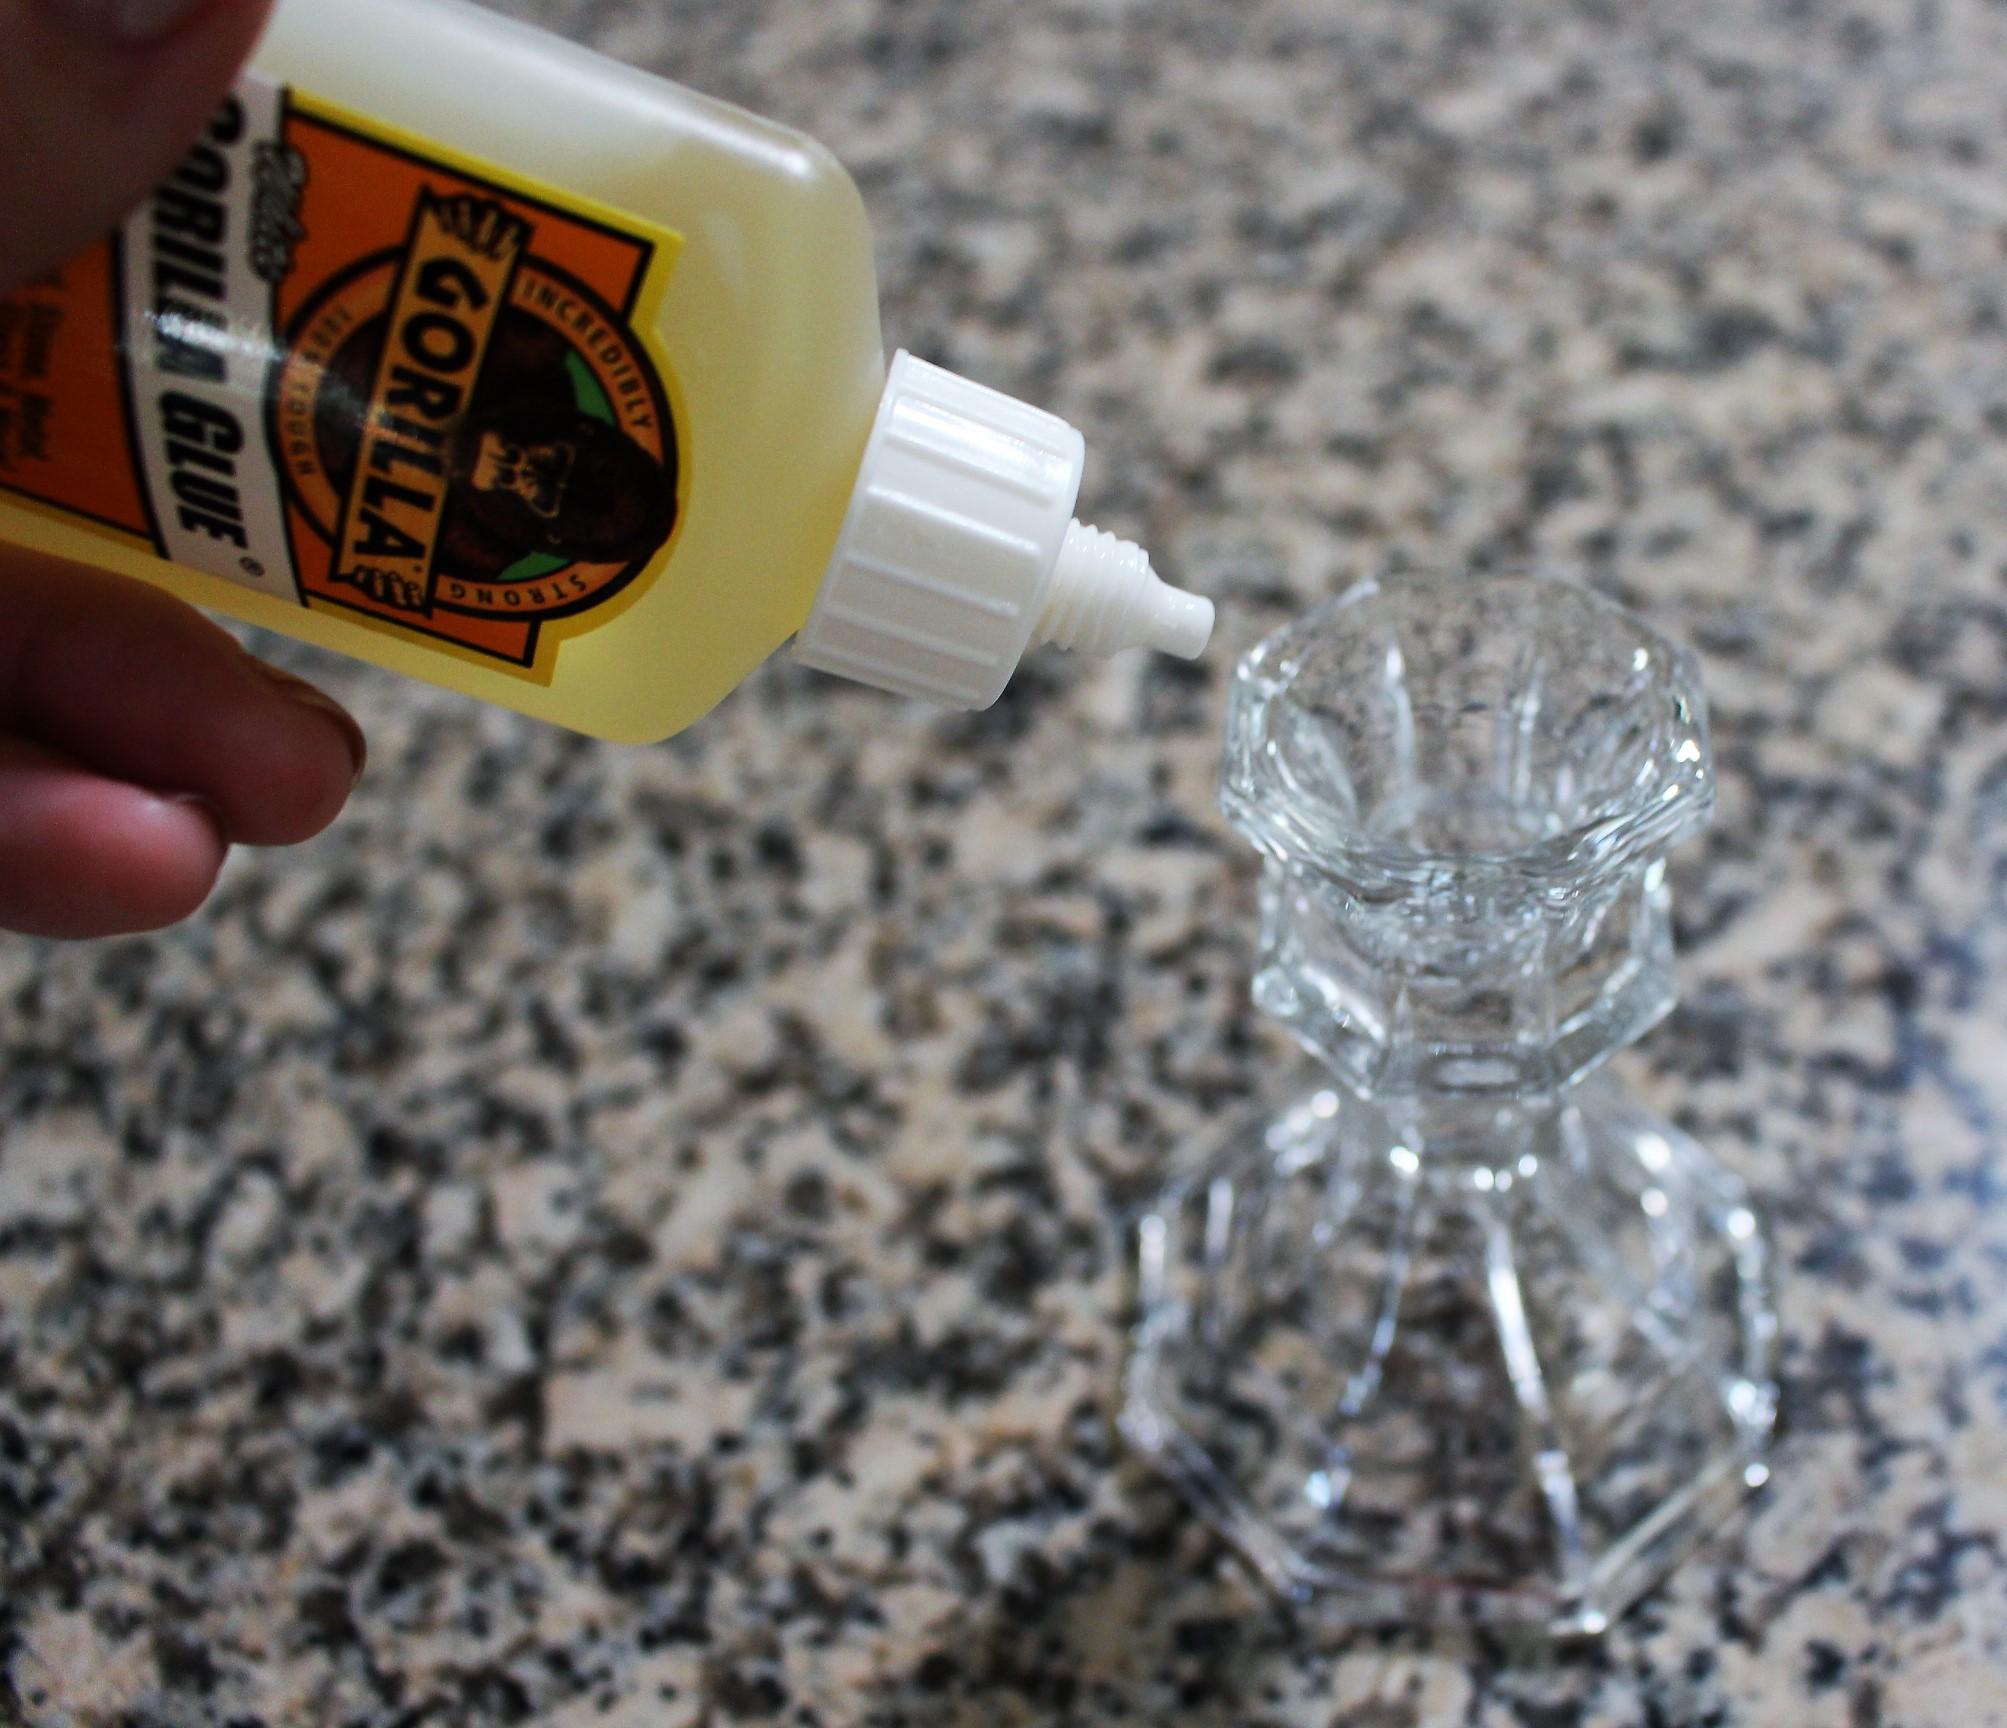 Gorilla Glue works wonderfully!